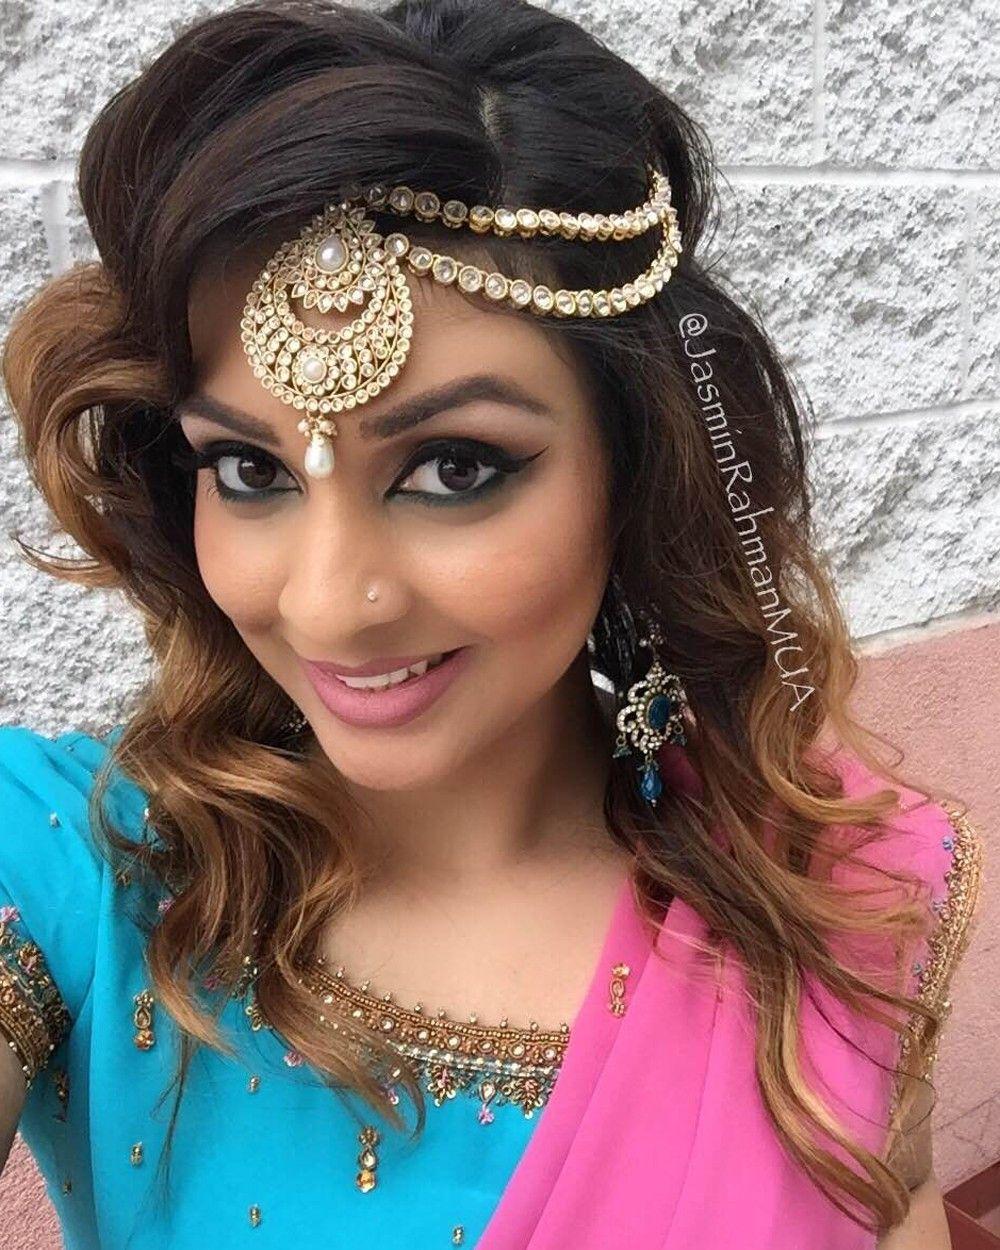 mansi mathapatti headpiece by indiatrendshop | hair